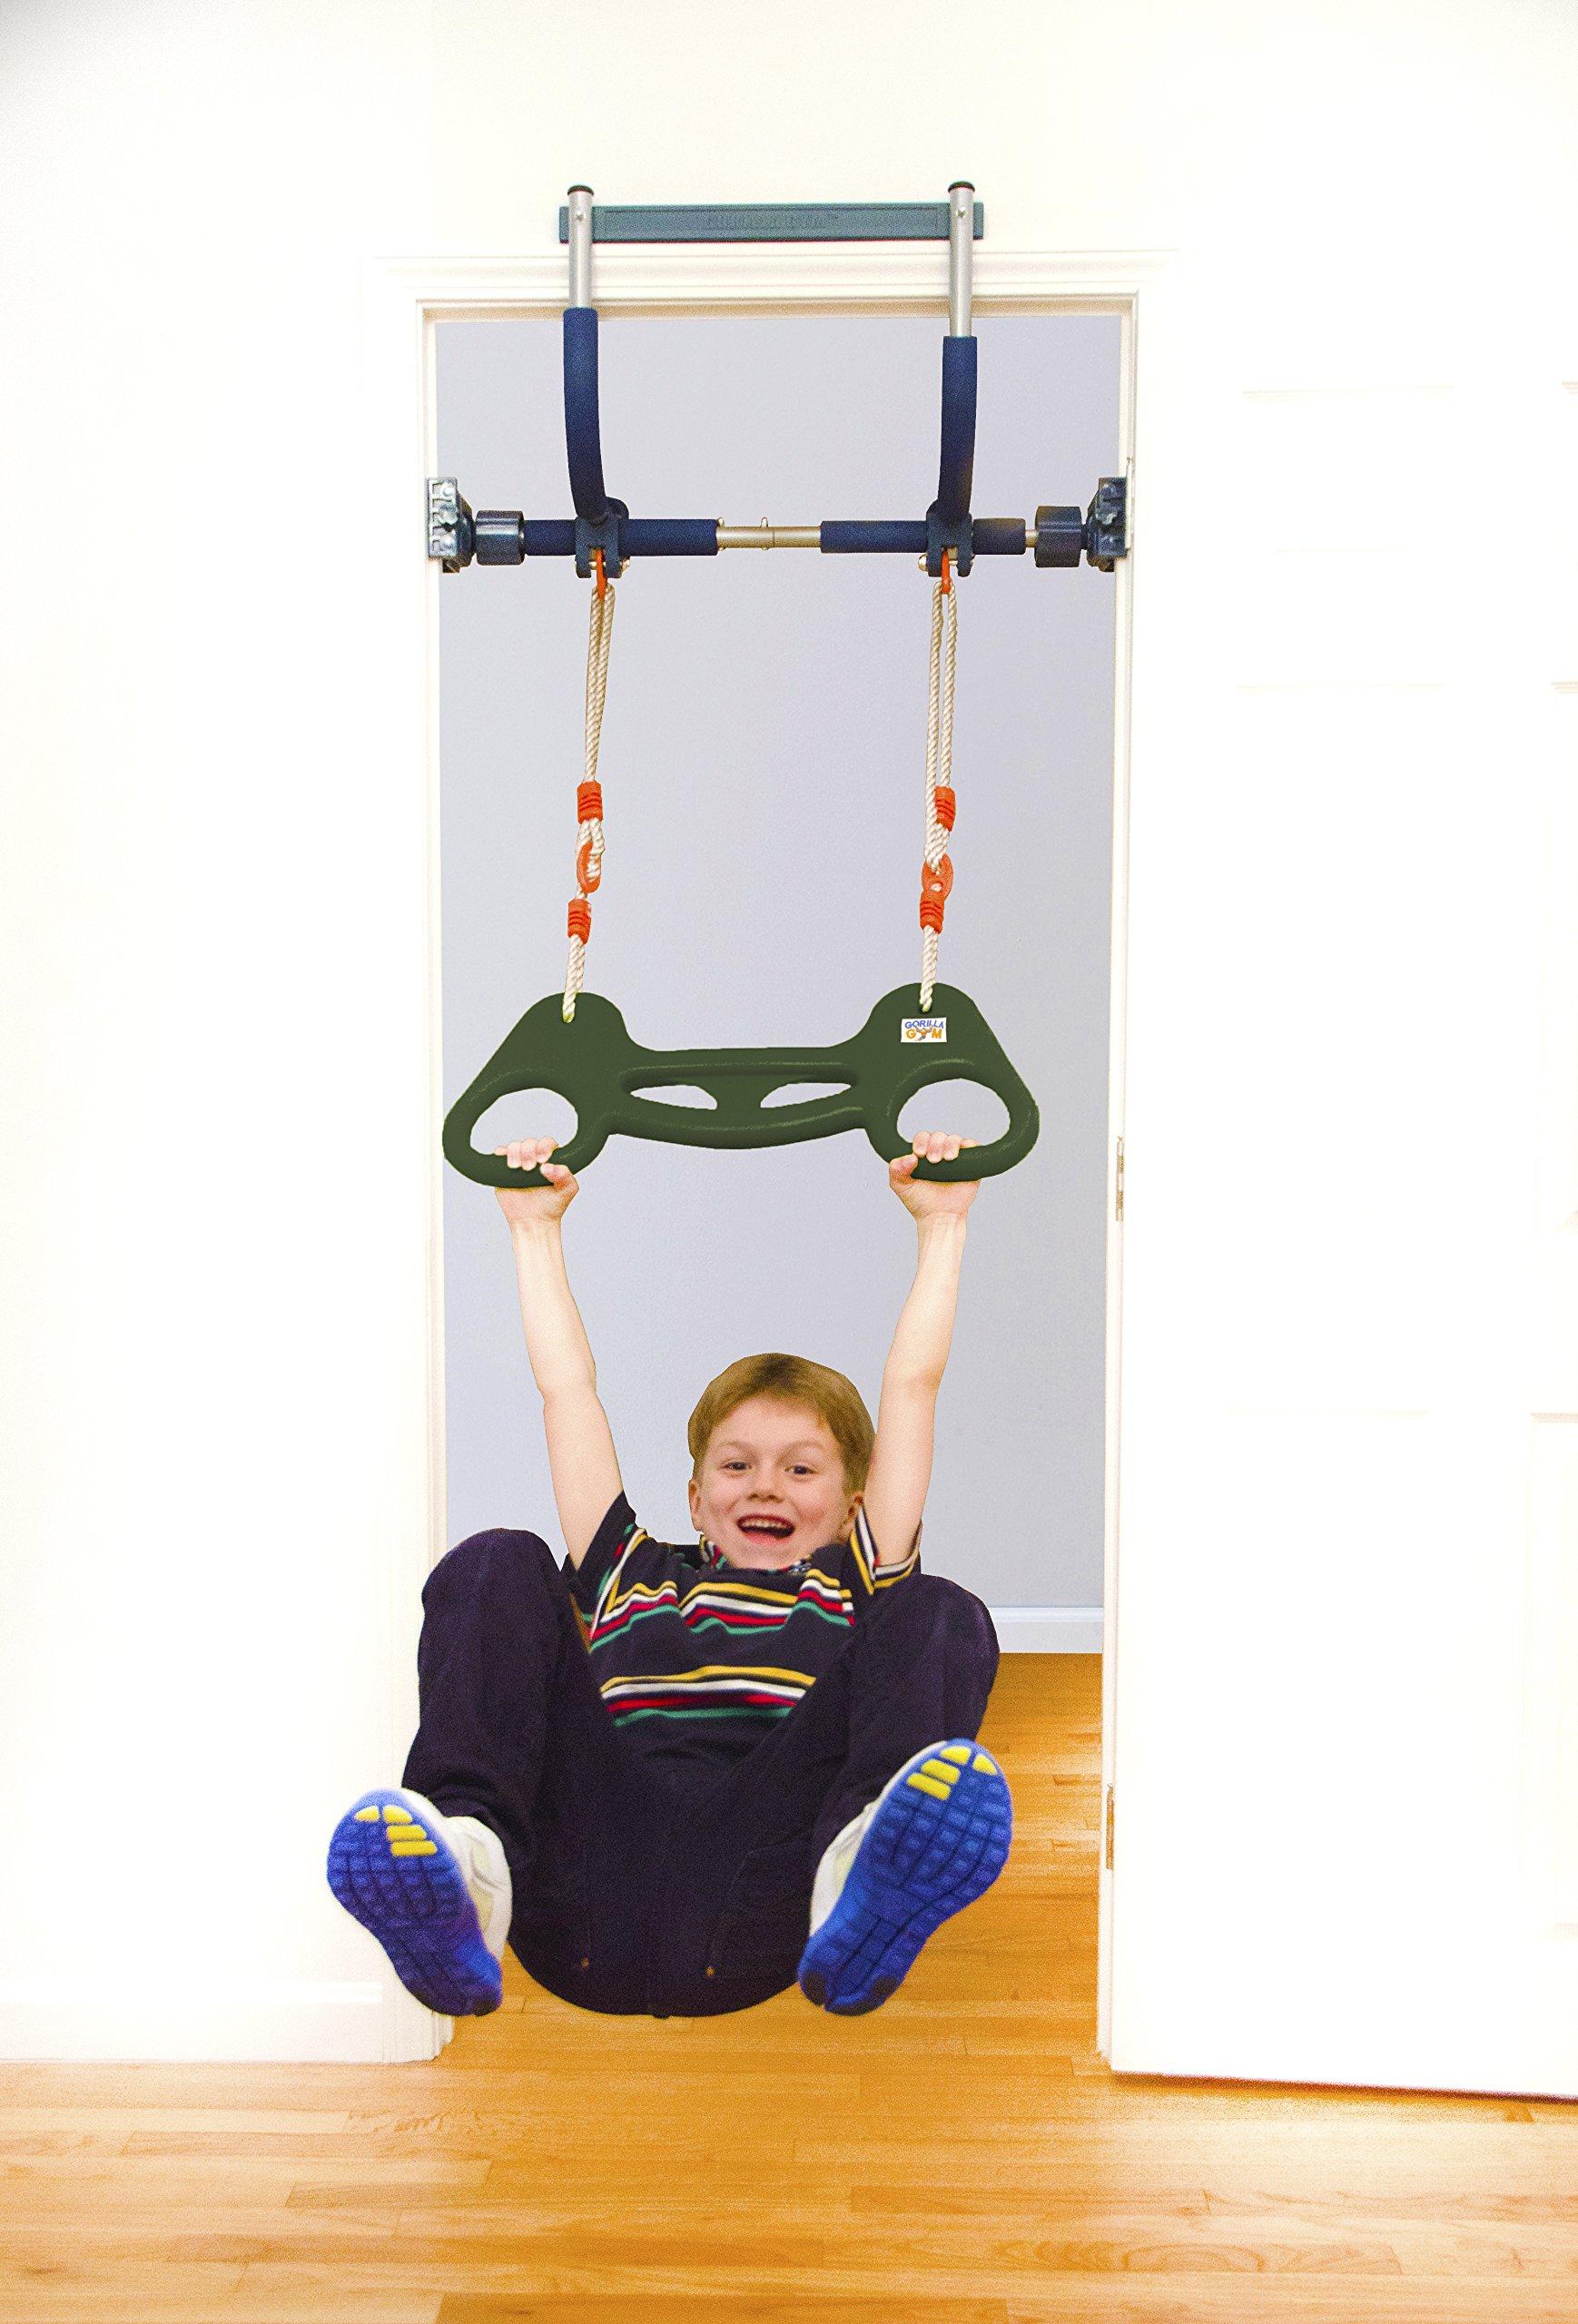 Gym1 Trapeze Bar Attachment by Gym1